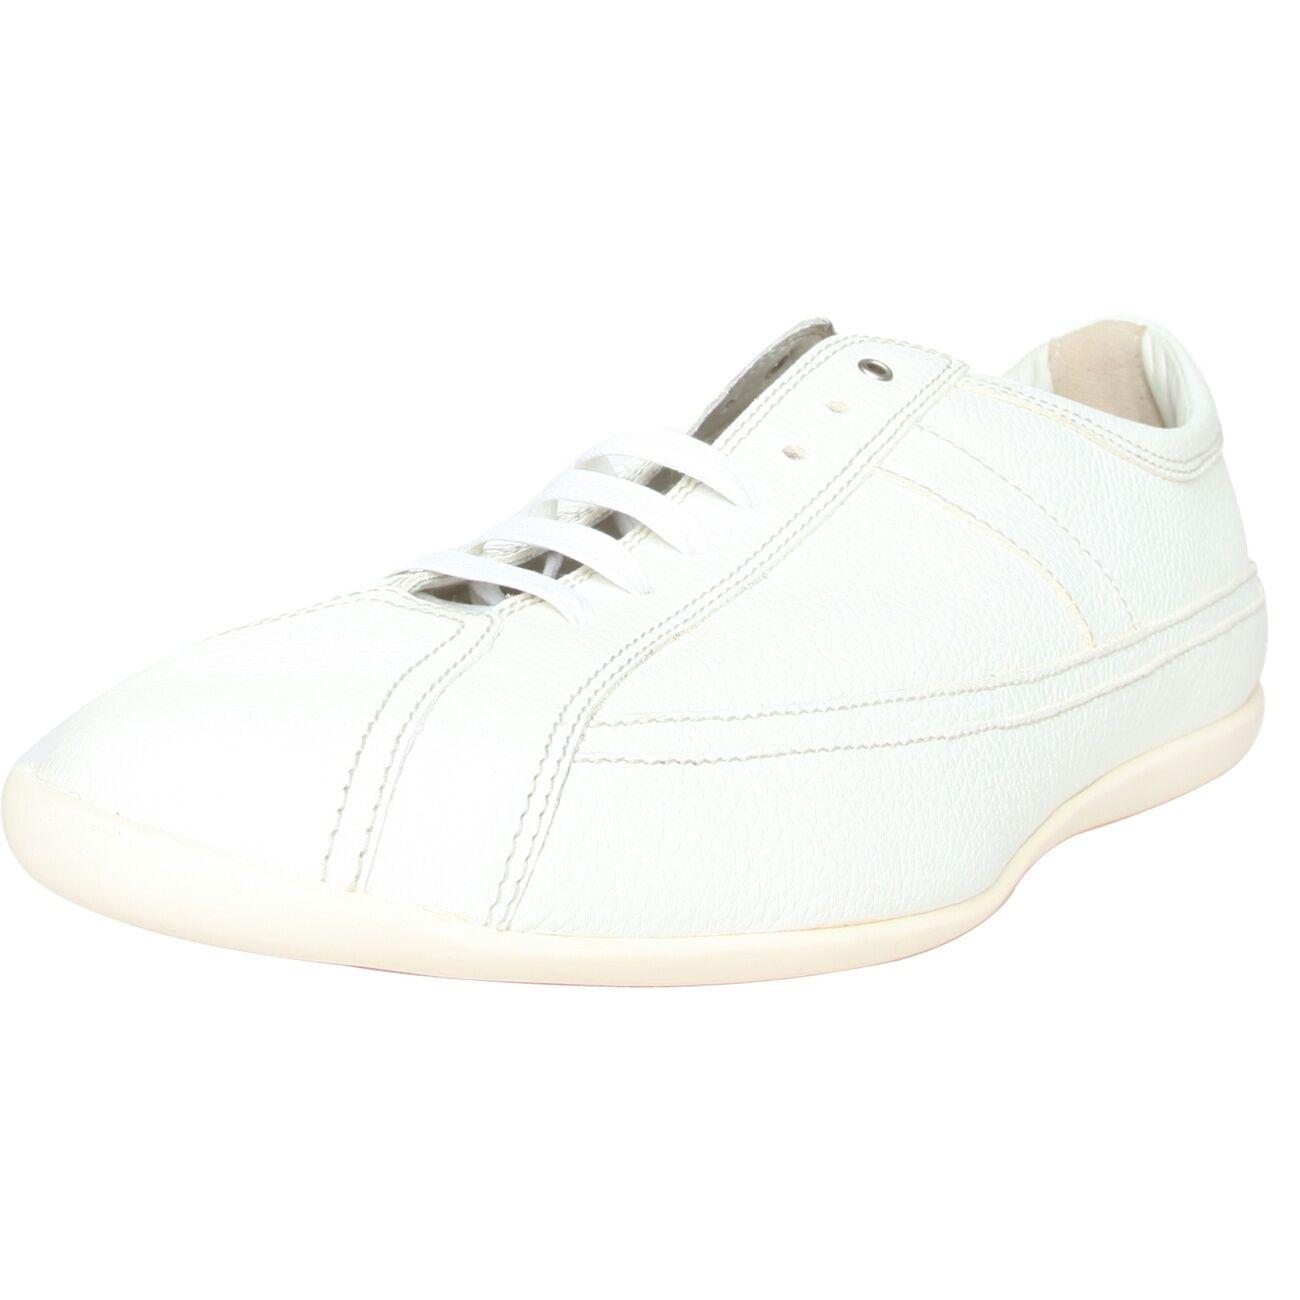 FRATELLI ROSSETTI WINDER Turnschuhe 46280 Herren Sneakers Turnschuhe WINDER EU 46, 47 UK 11, 11.5 dac6b1